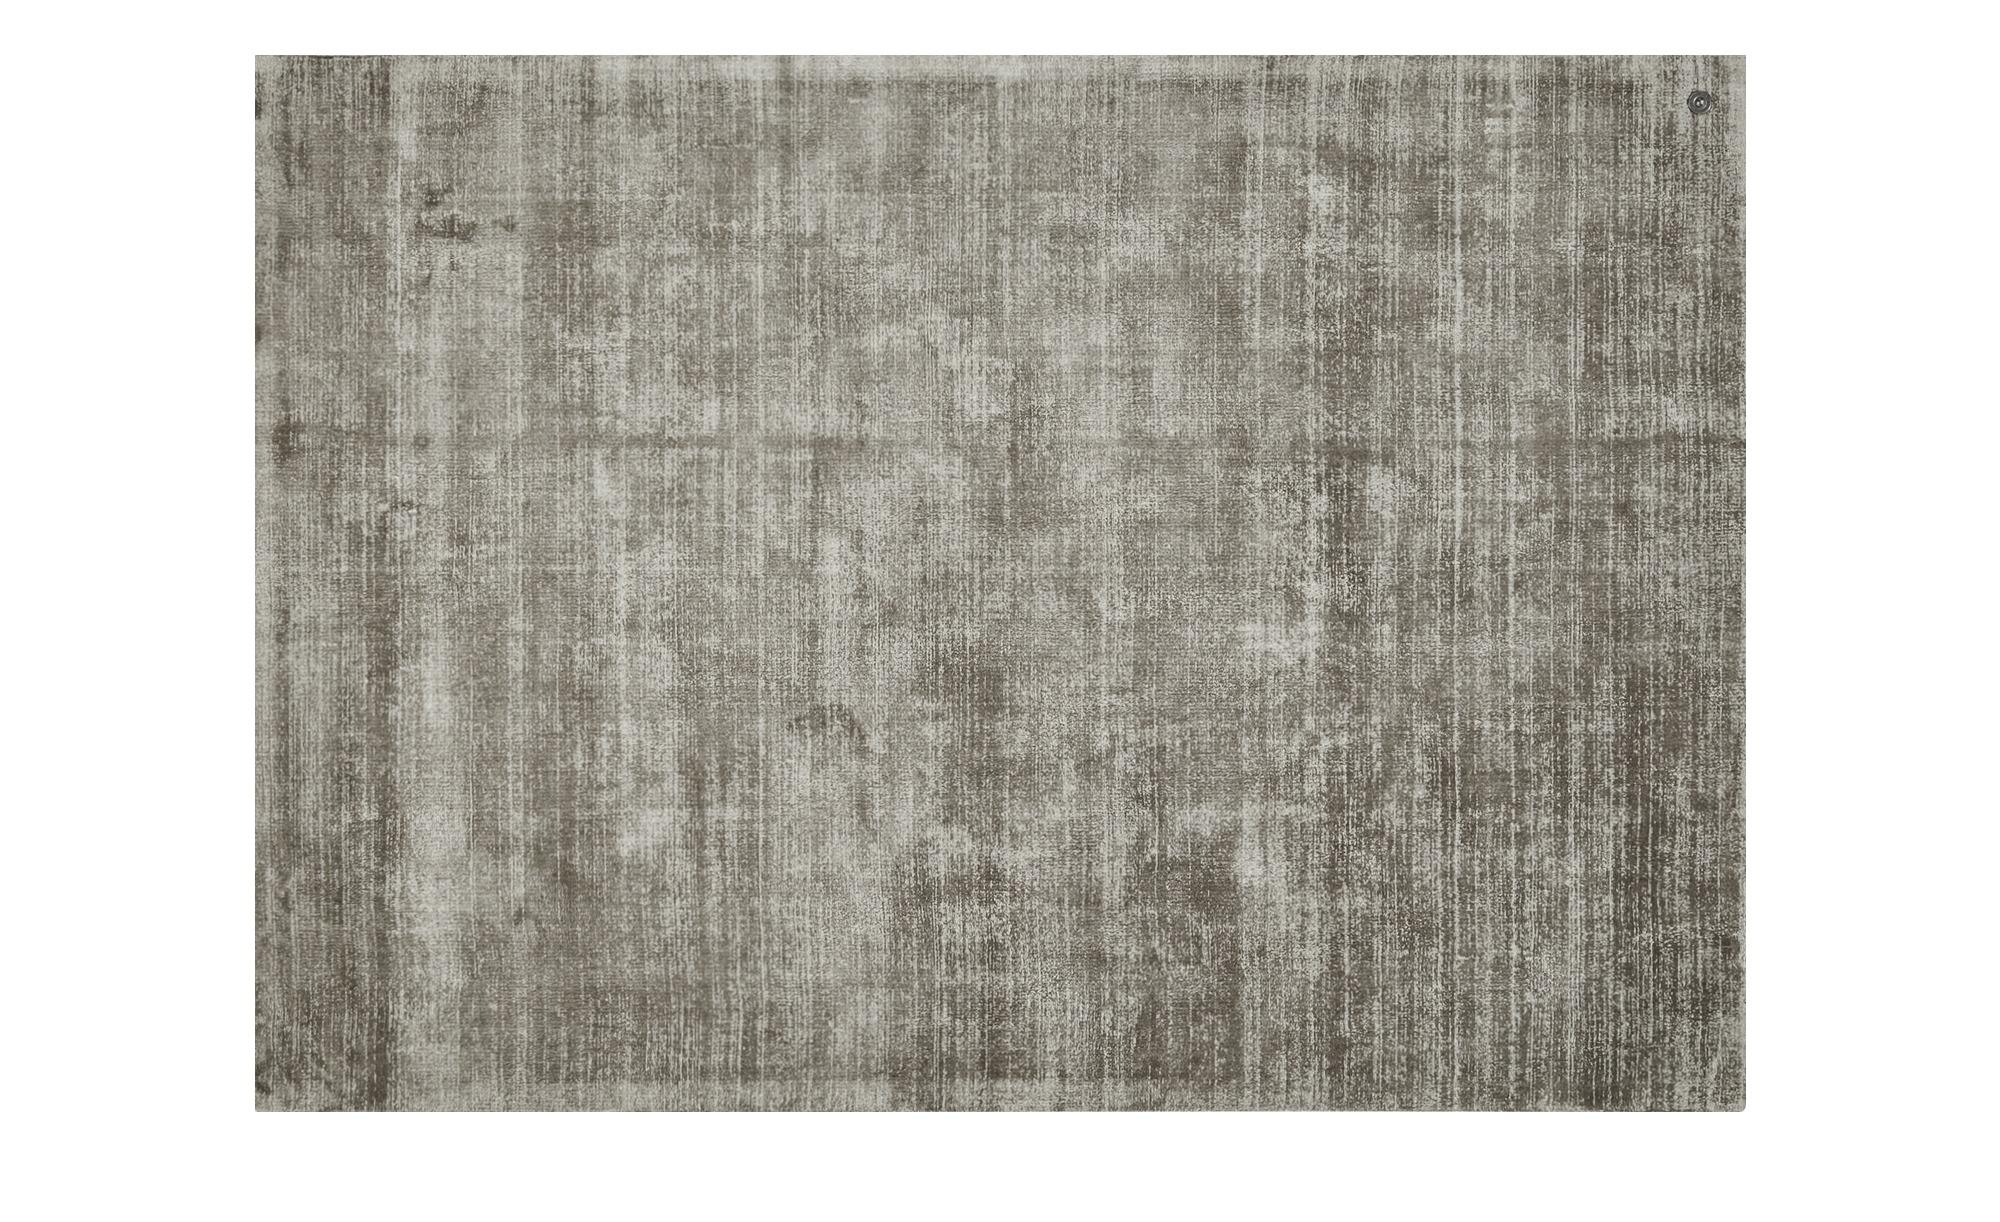 tom tailor teppich handgewebt shine breite 65 cm h he. Black Bedroom Furniture Sets. Home Design Ideas